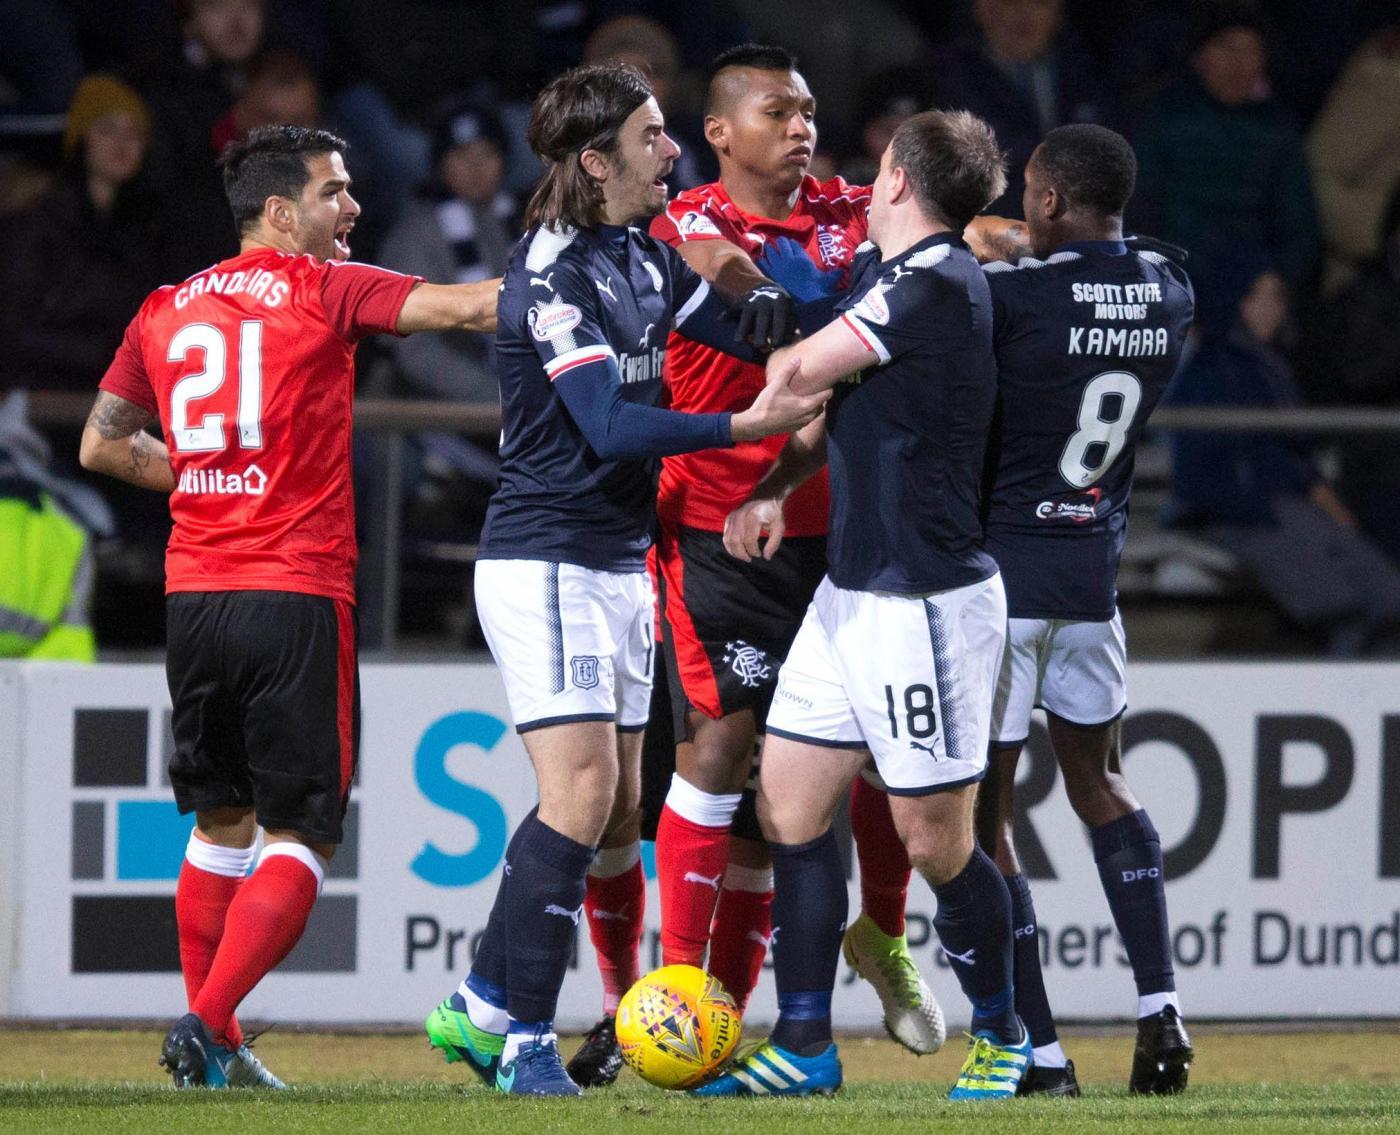 Scozia Premiership, Dundee United-St. Mirren 22 maggio: finale play off d'andata a Tannadice Park